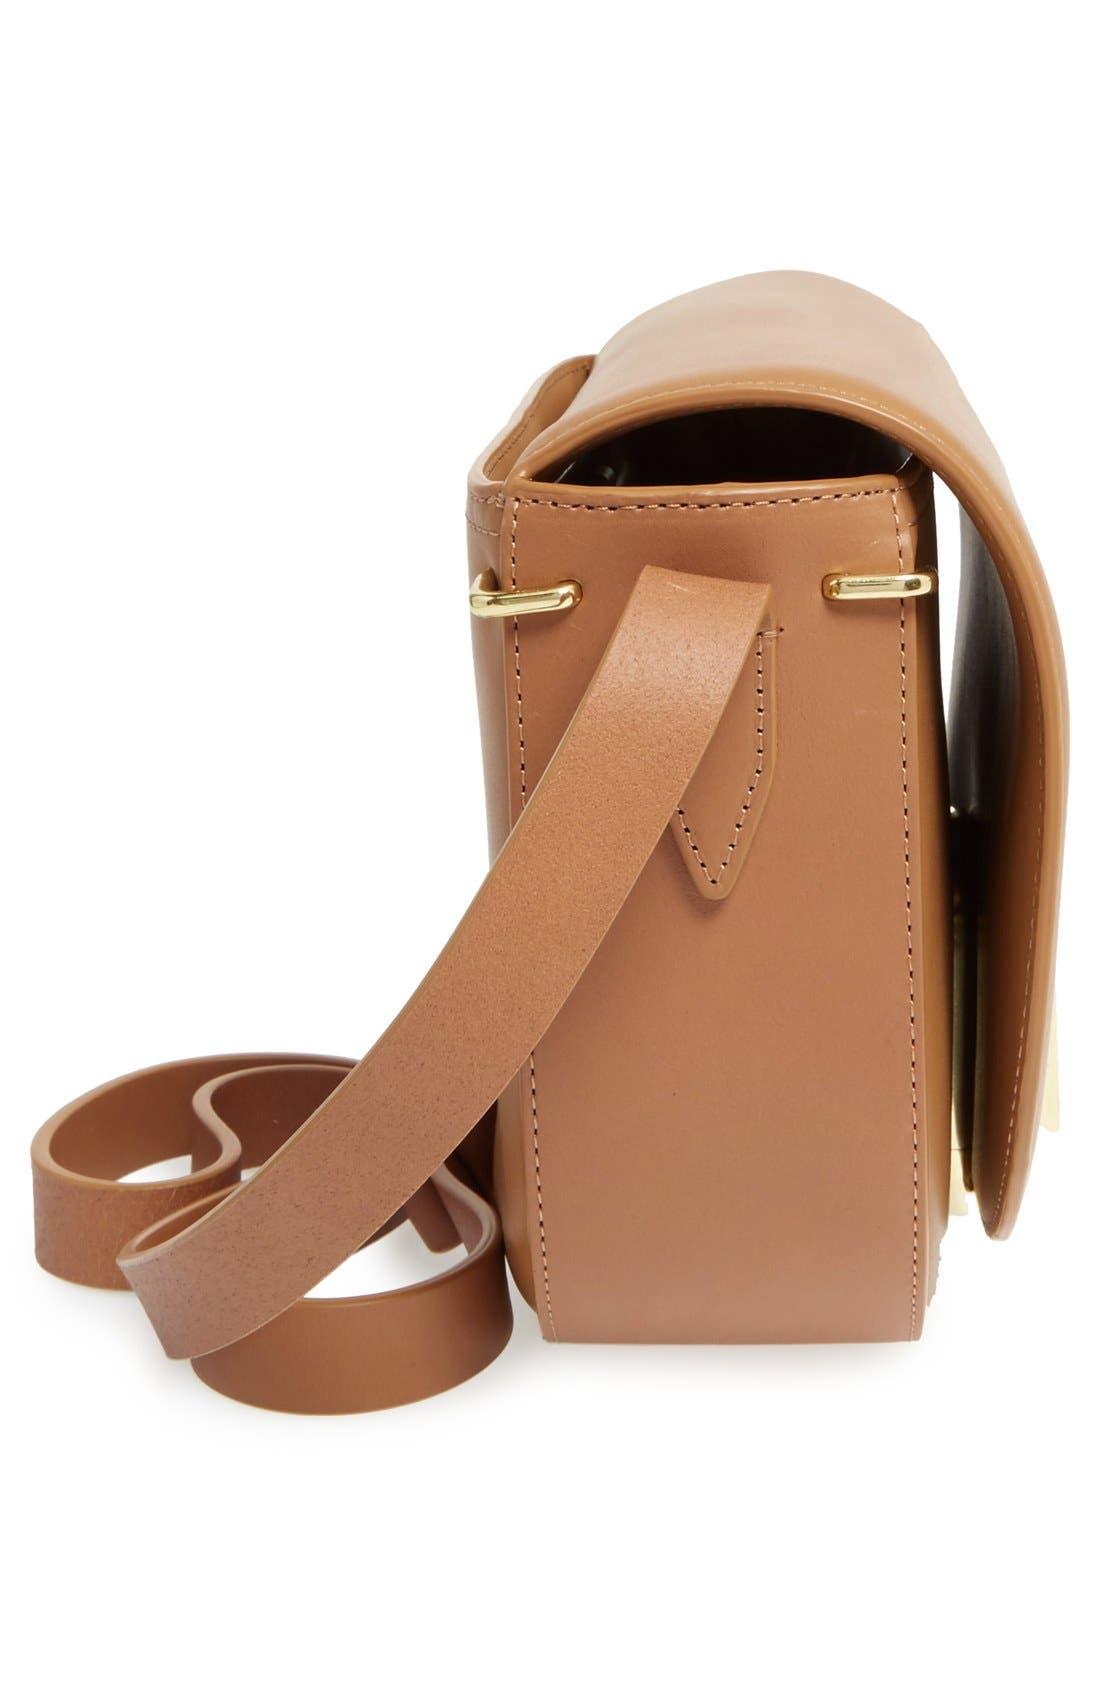 Alix Leather Saddle Bag,                             Alternate thumbnail 5, color,                             Camel